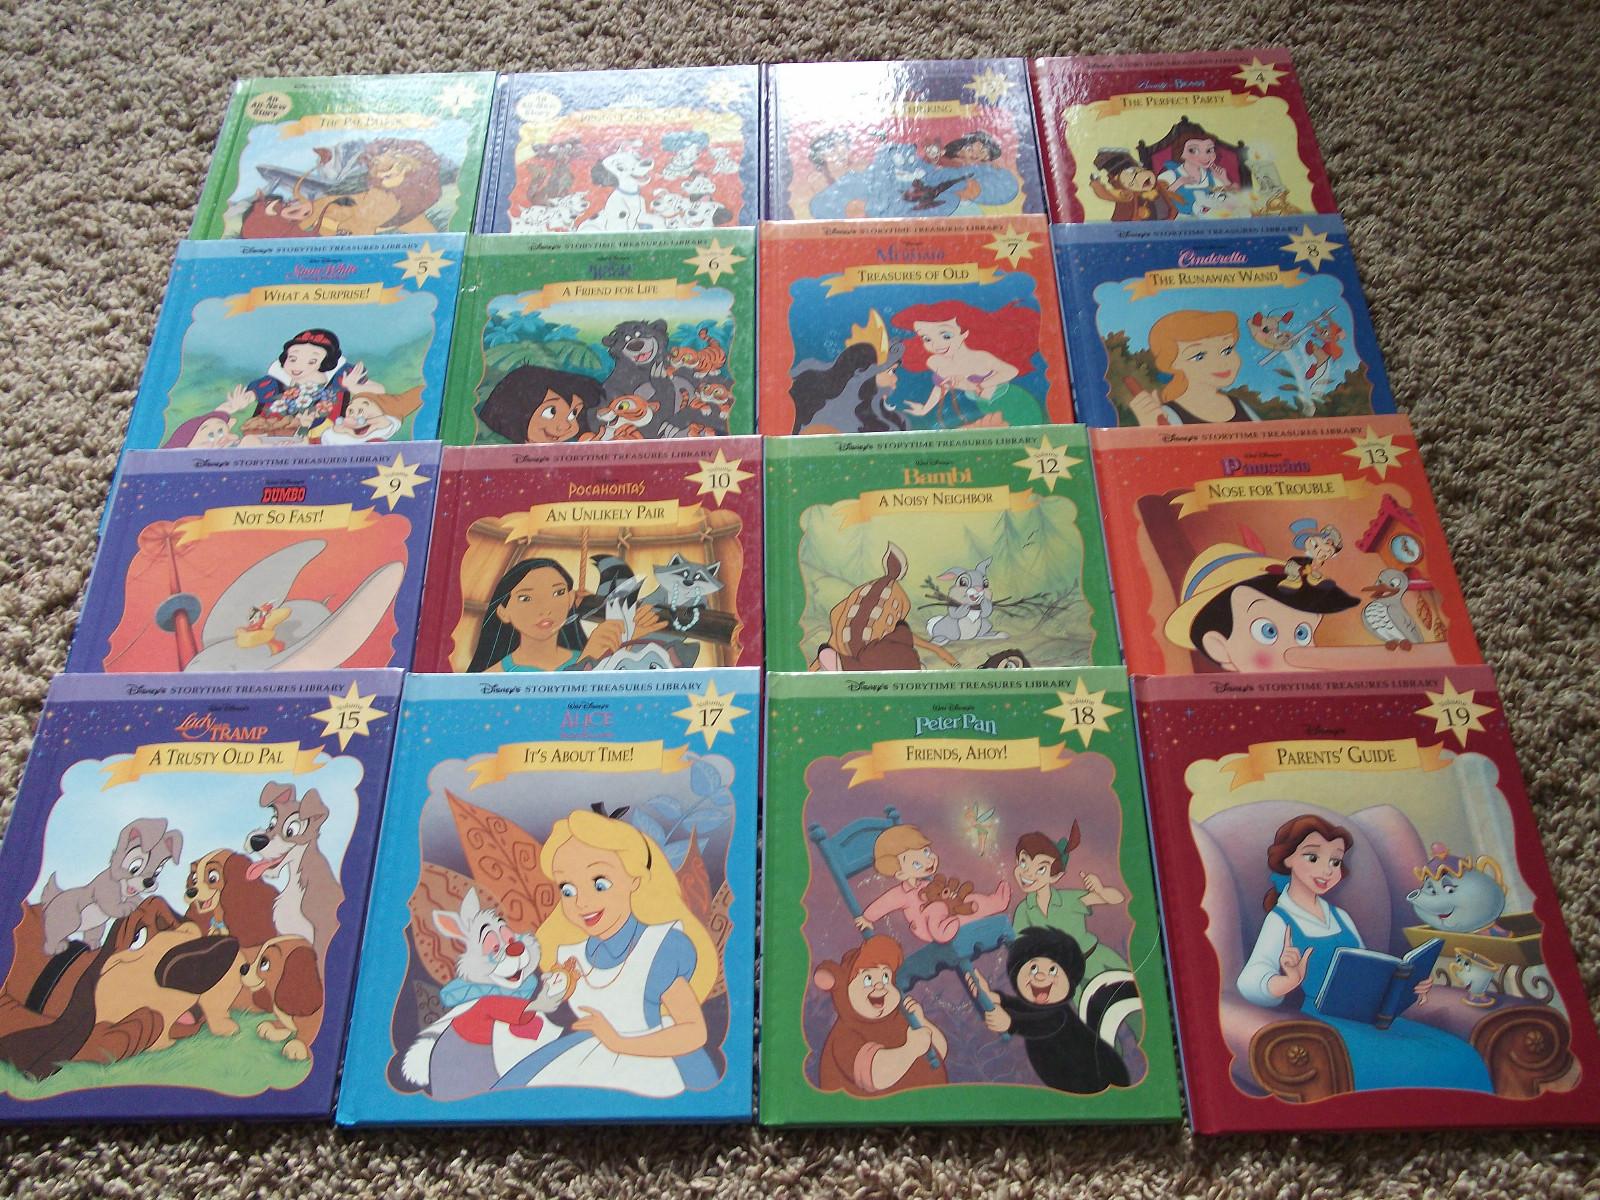 Disney S Storytime Treasures Library Disney Wiki